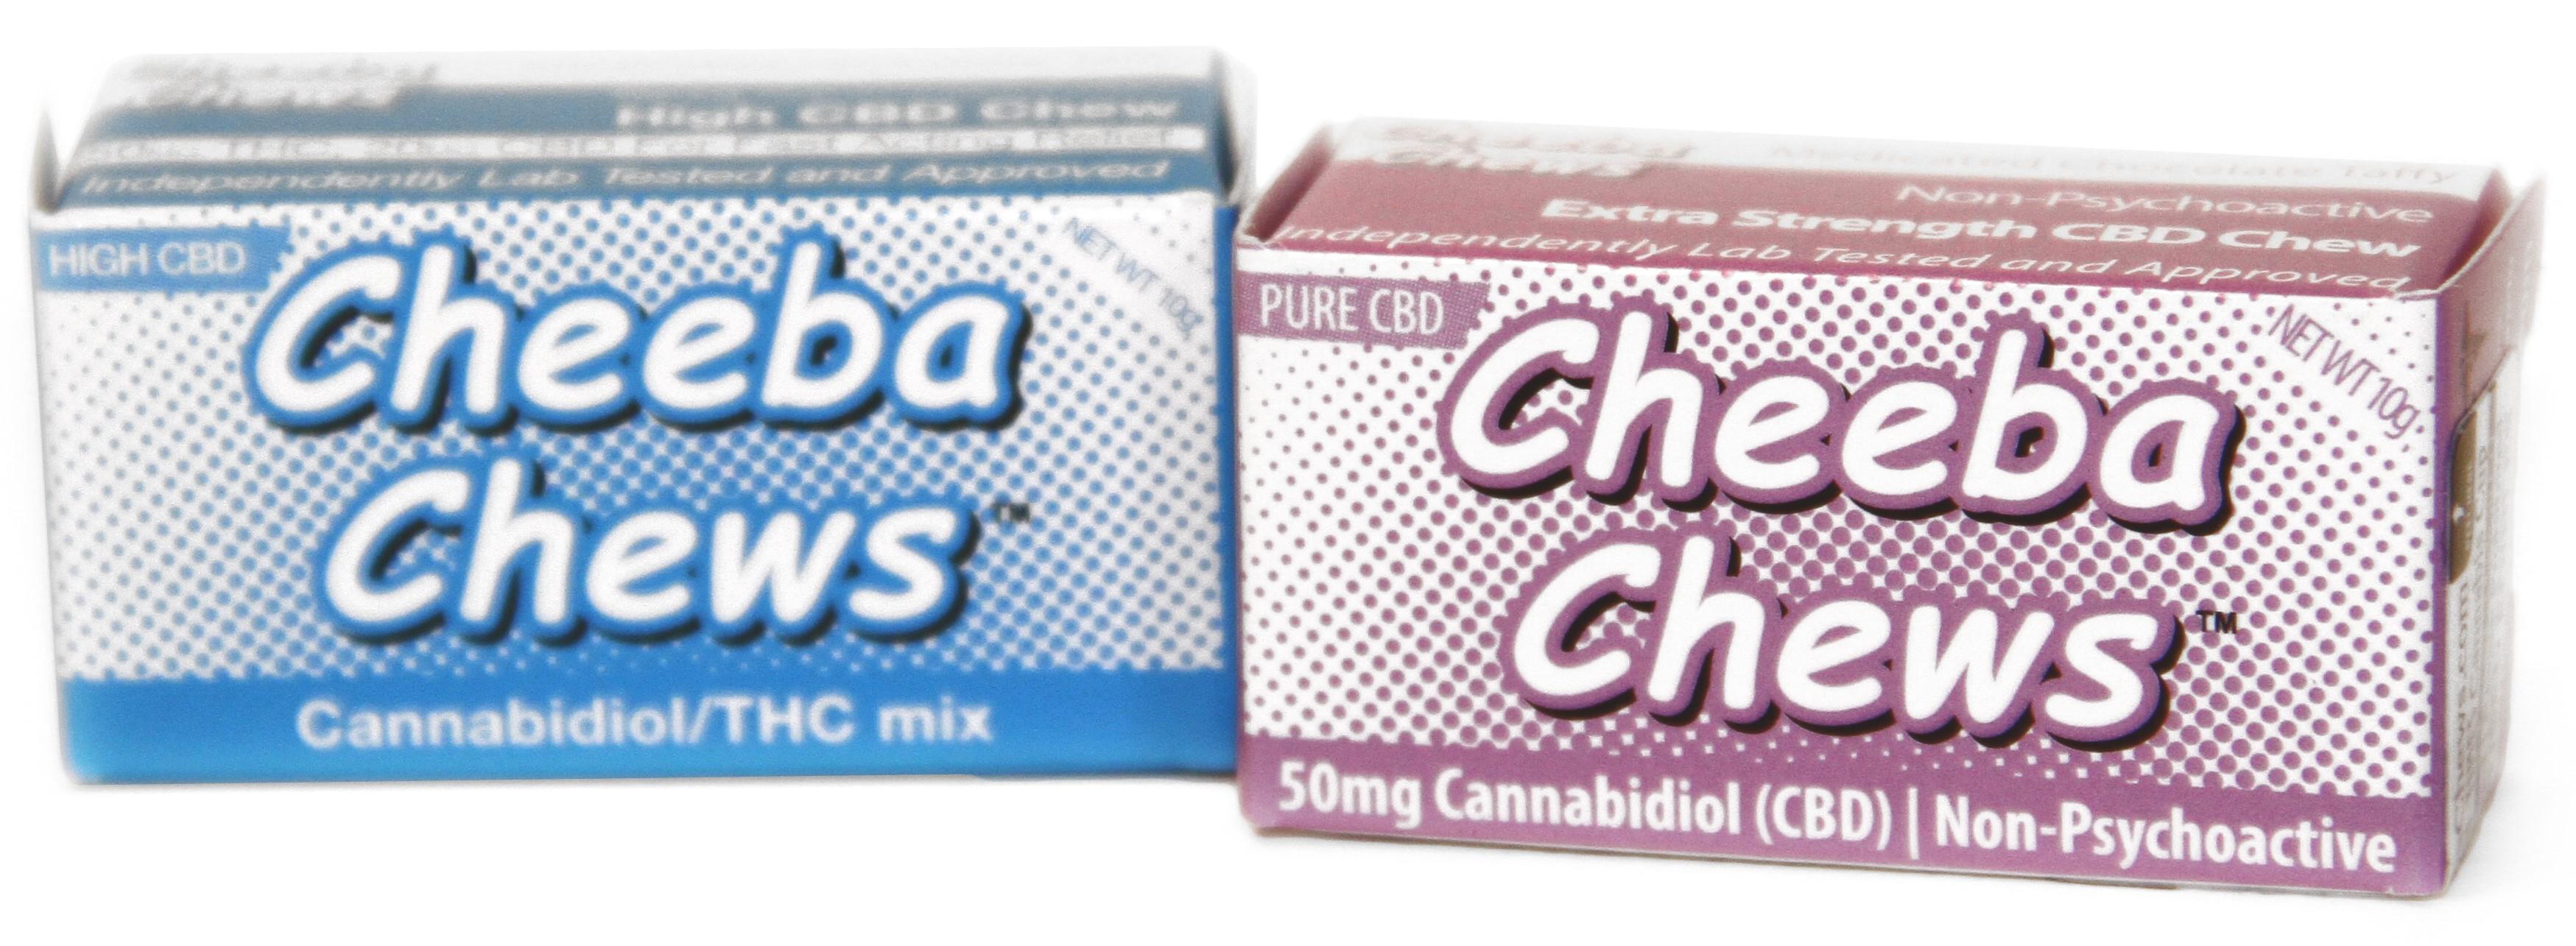 Cheeba Chews CBD